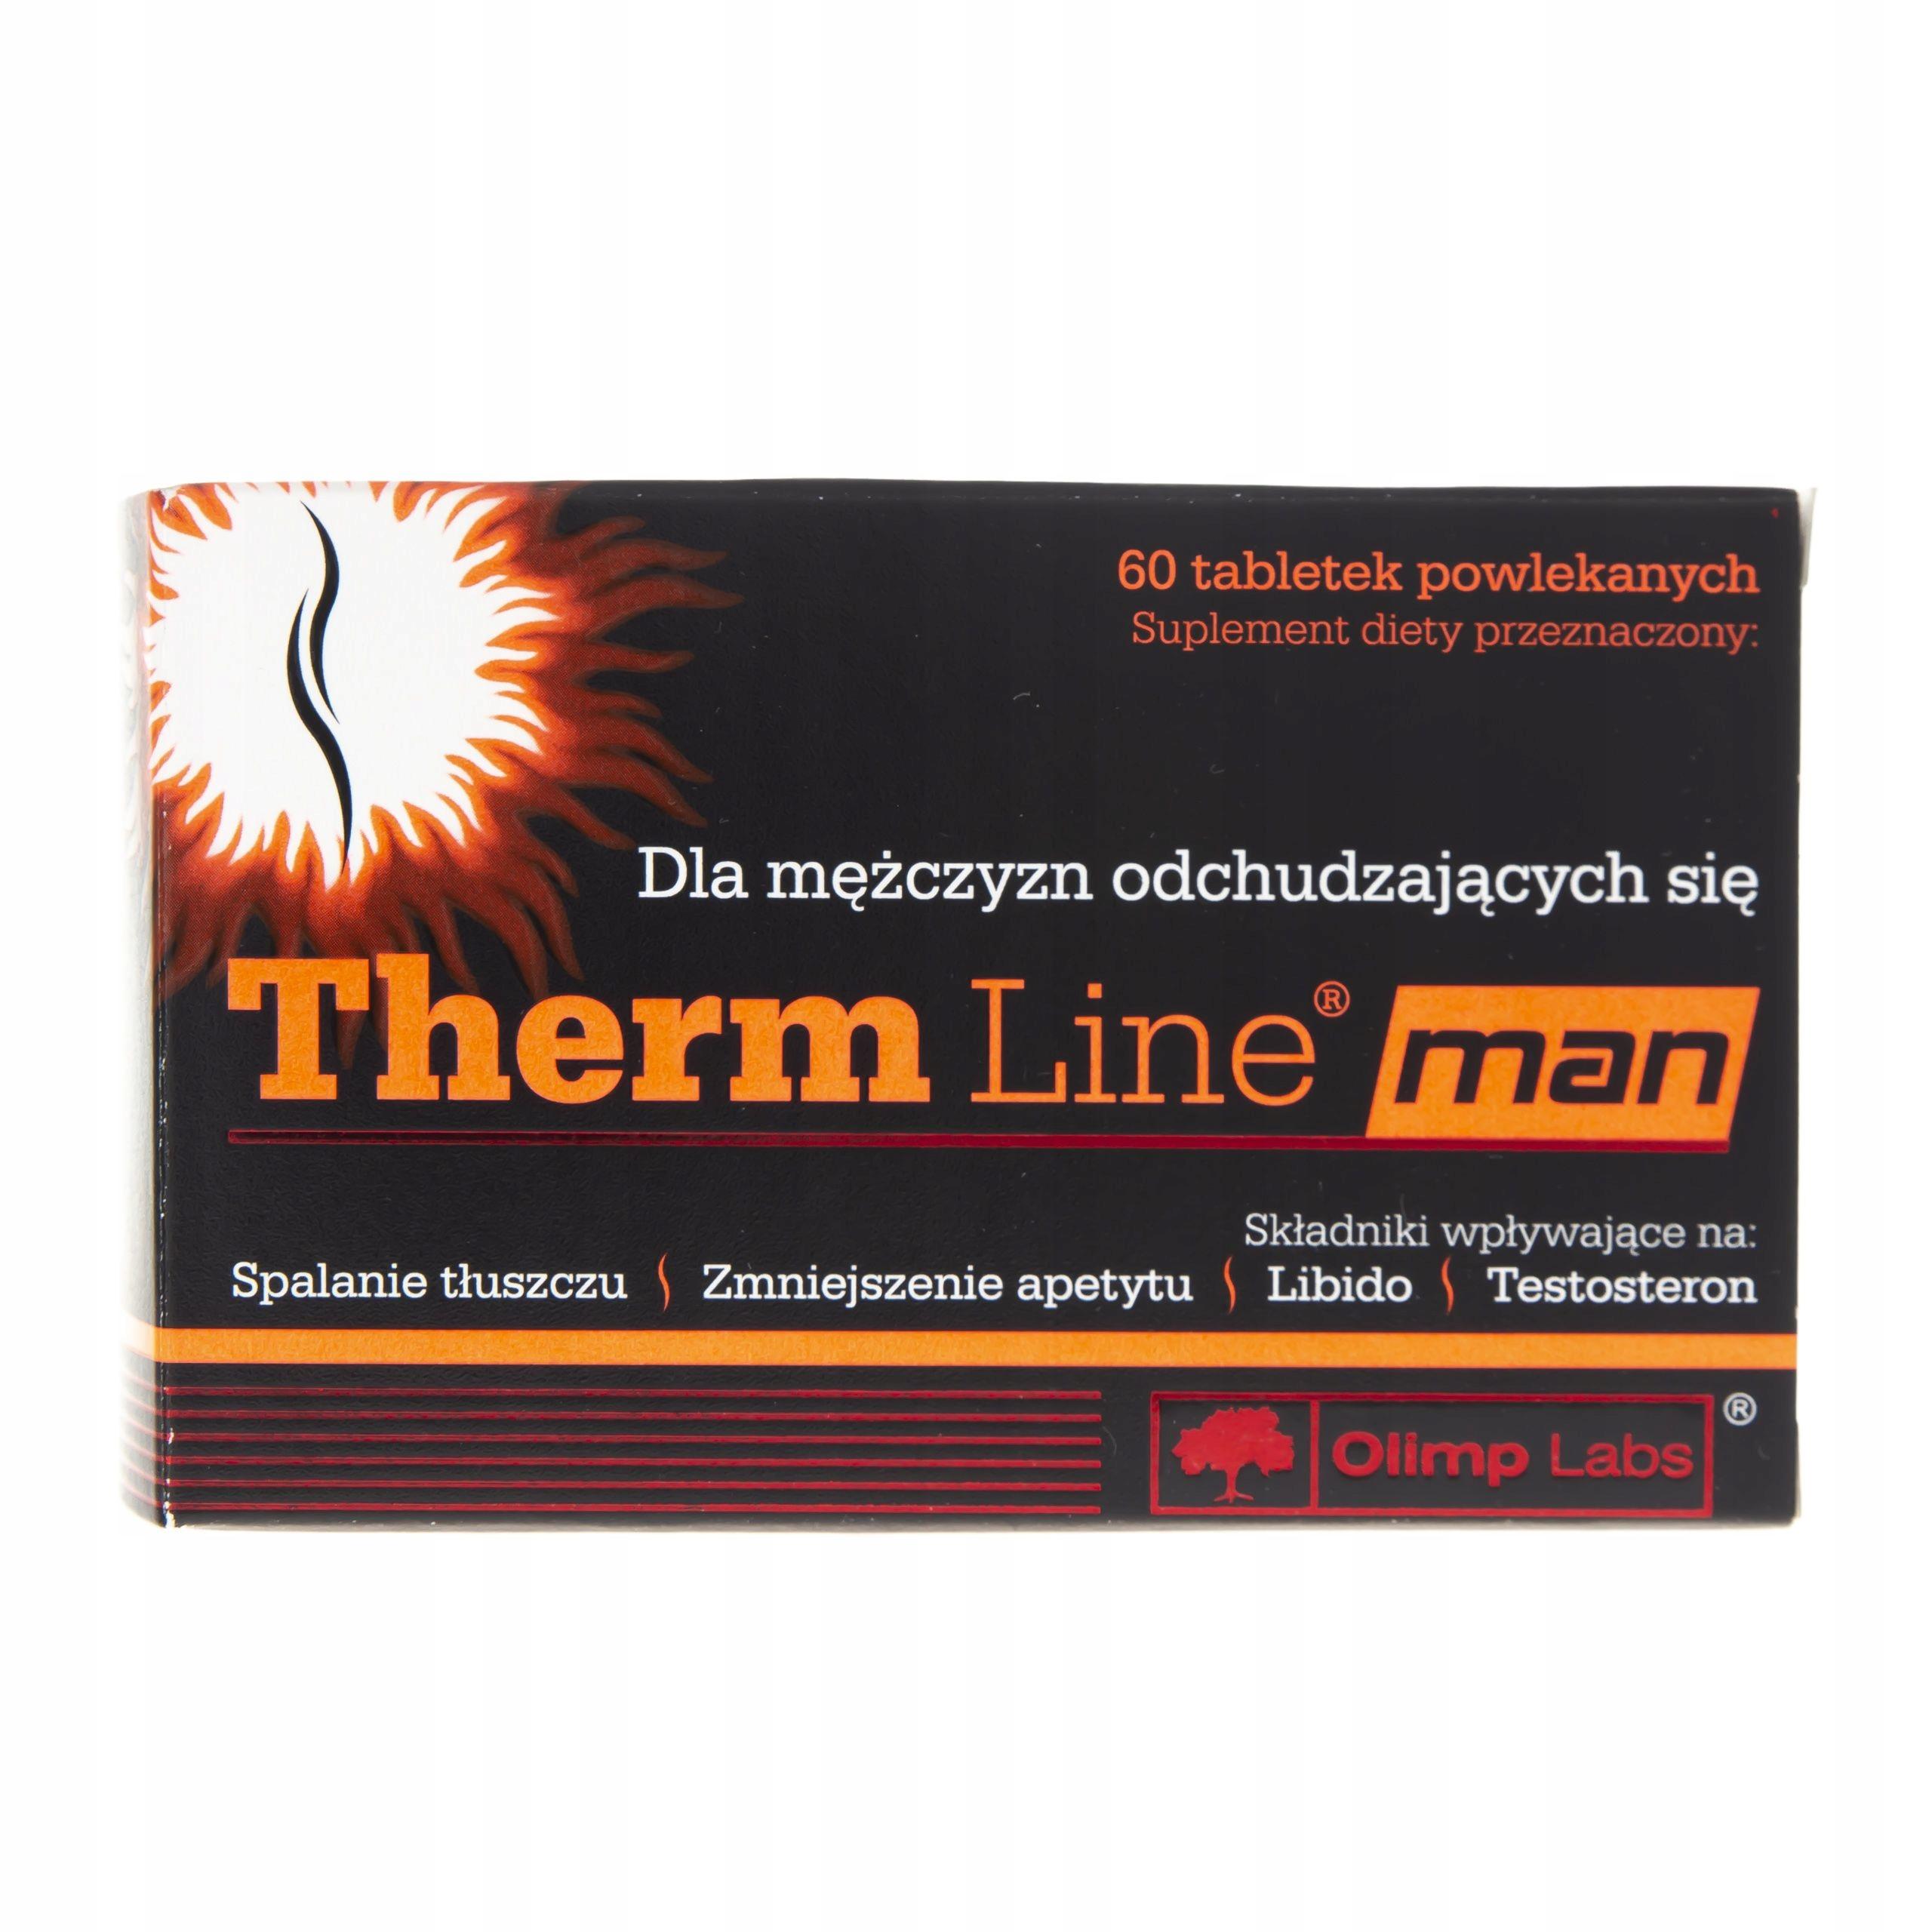 Olimp Therm Line man - 60 tabletek MĘSKIE LIBIDO